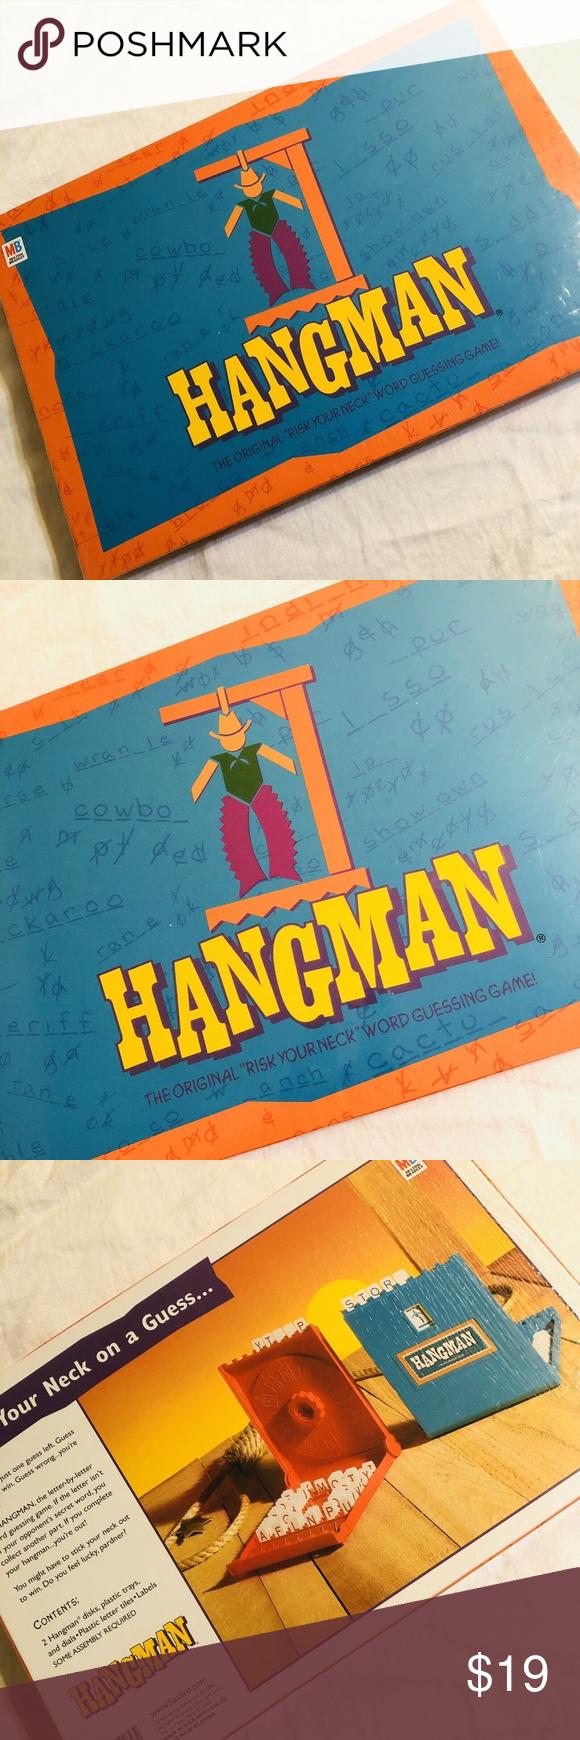 1999 Vintage HANGMAN Board Game MB Milton Bradley Vintage